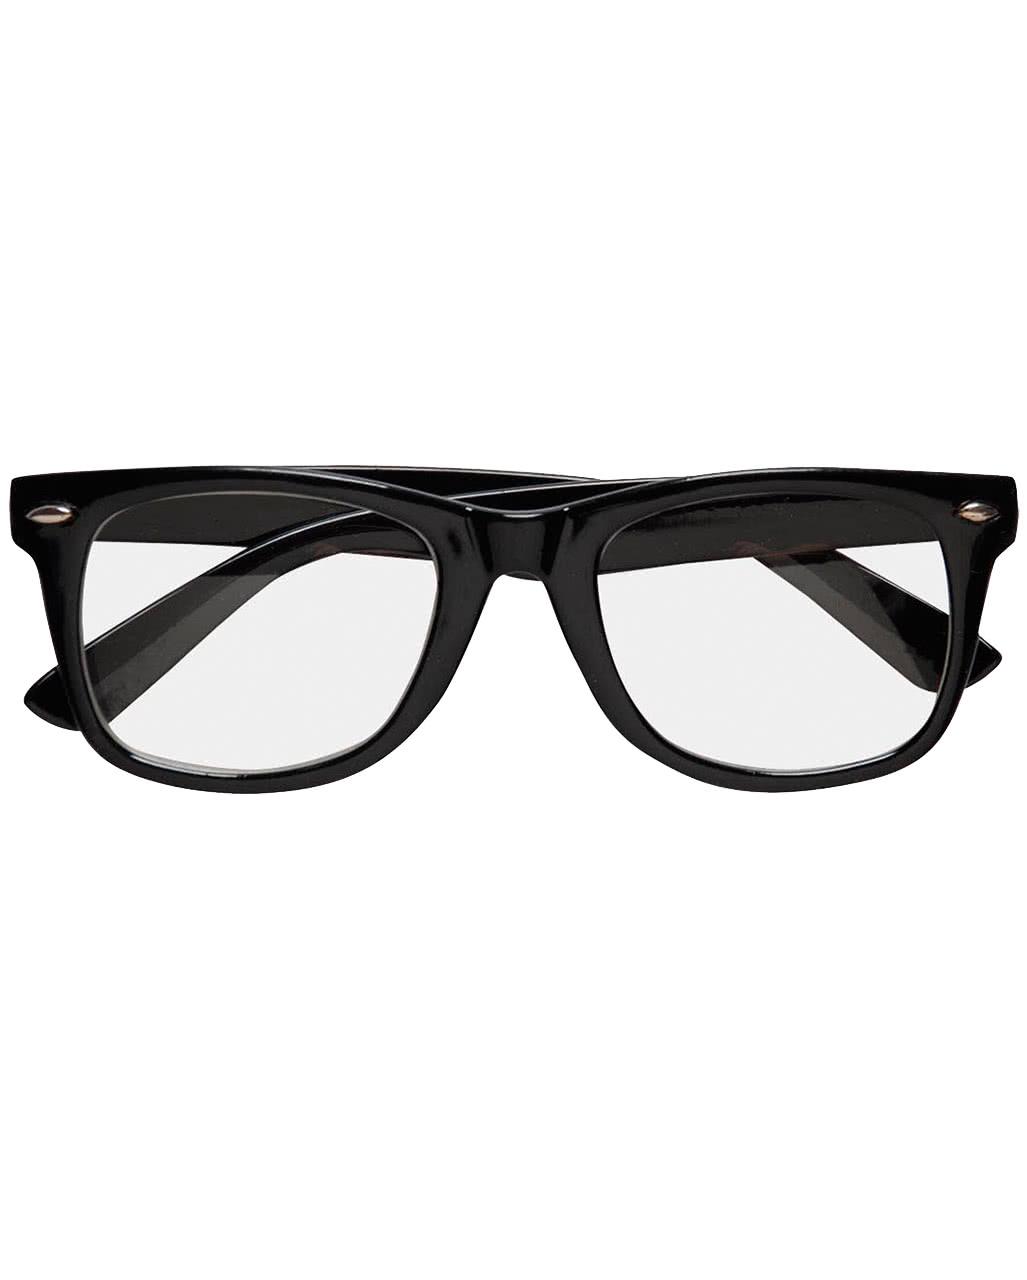 72647eaaac5 Black Nerd Glasses With Glasses Superman glasses